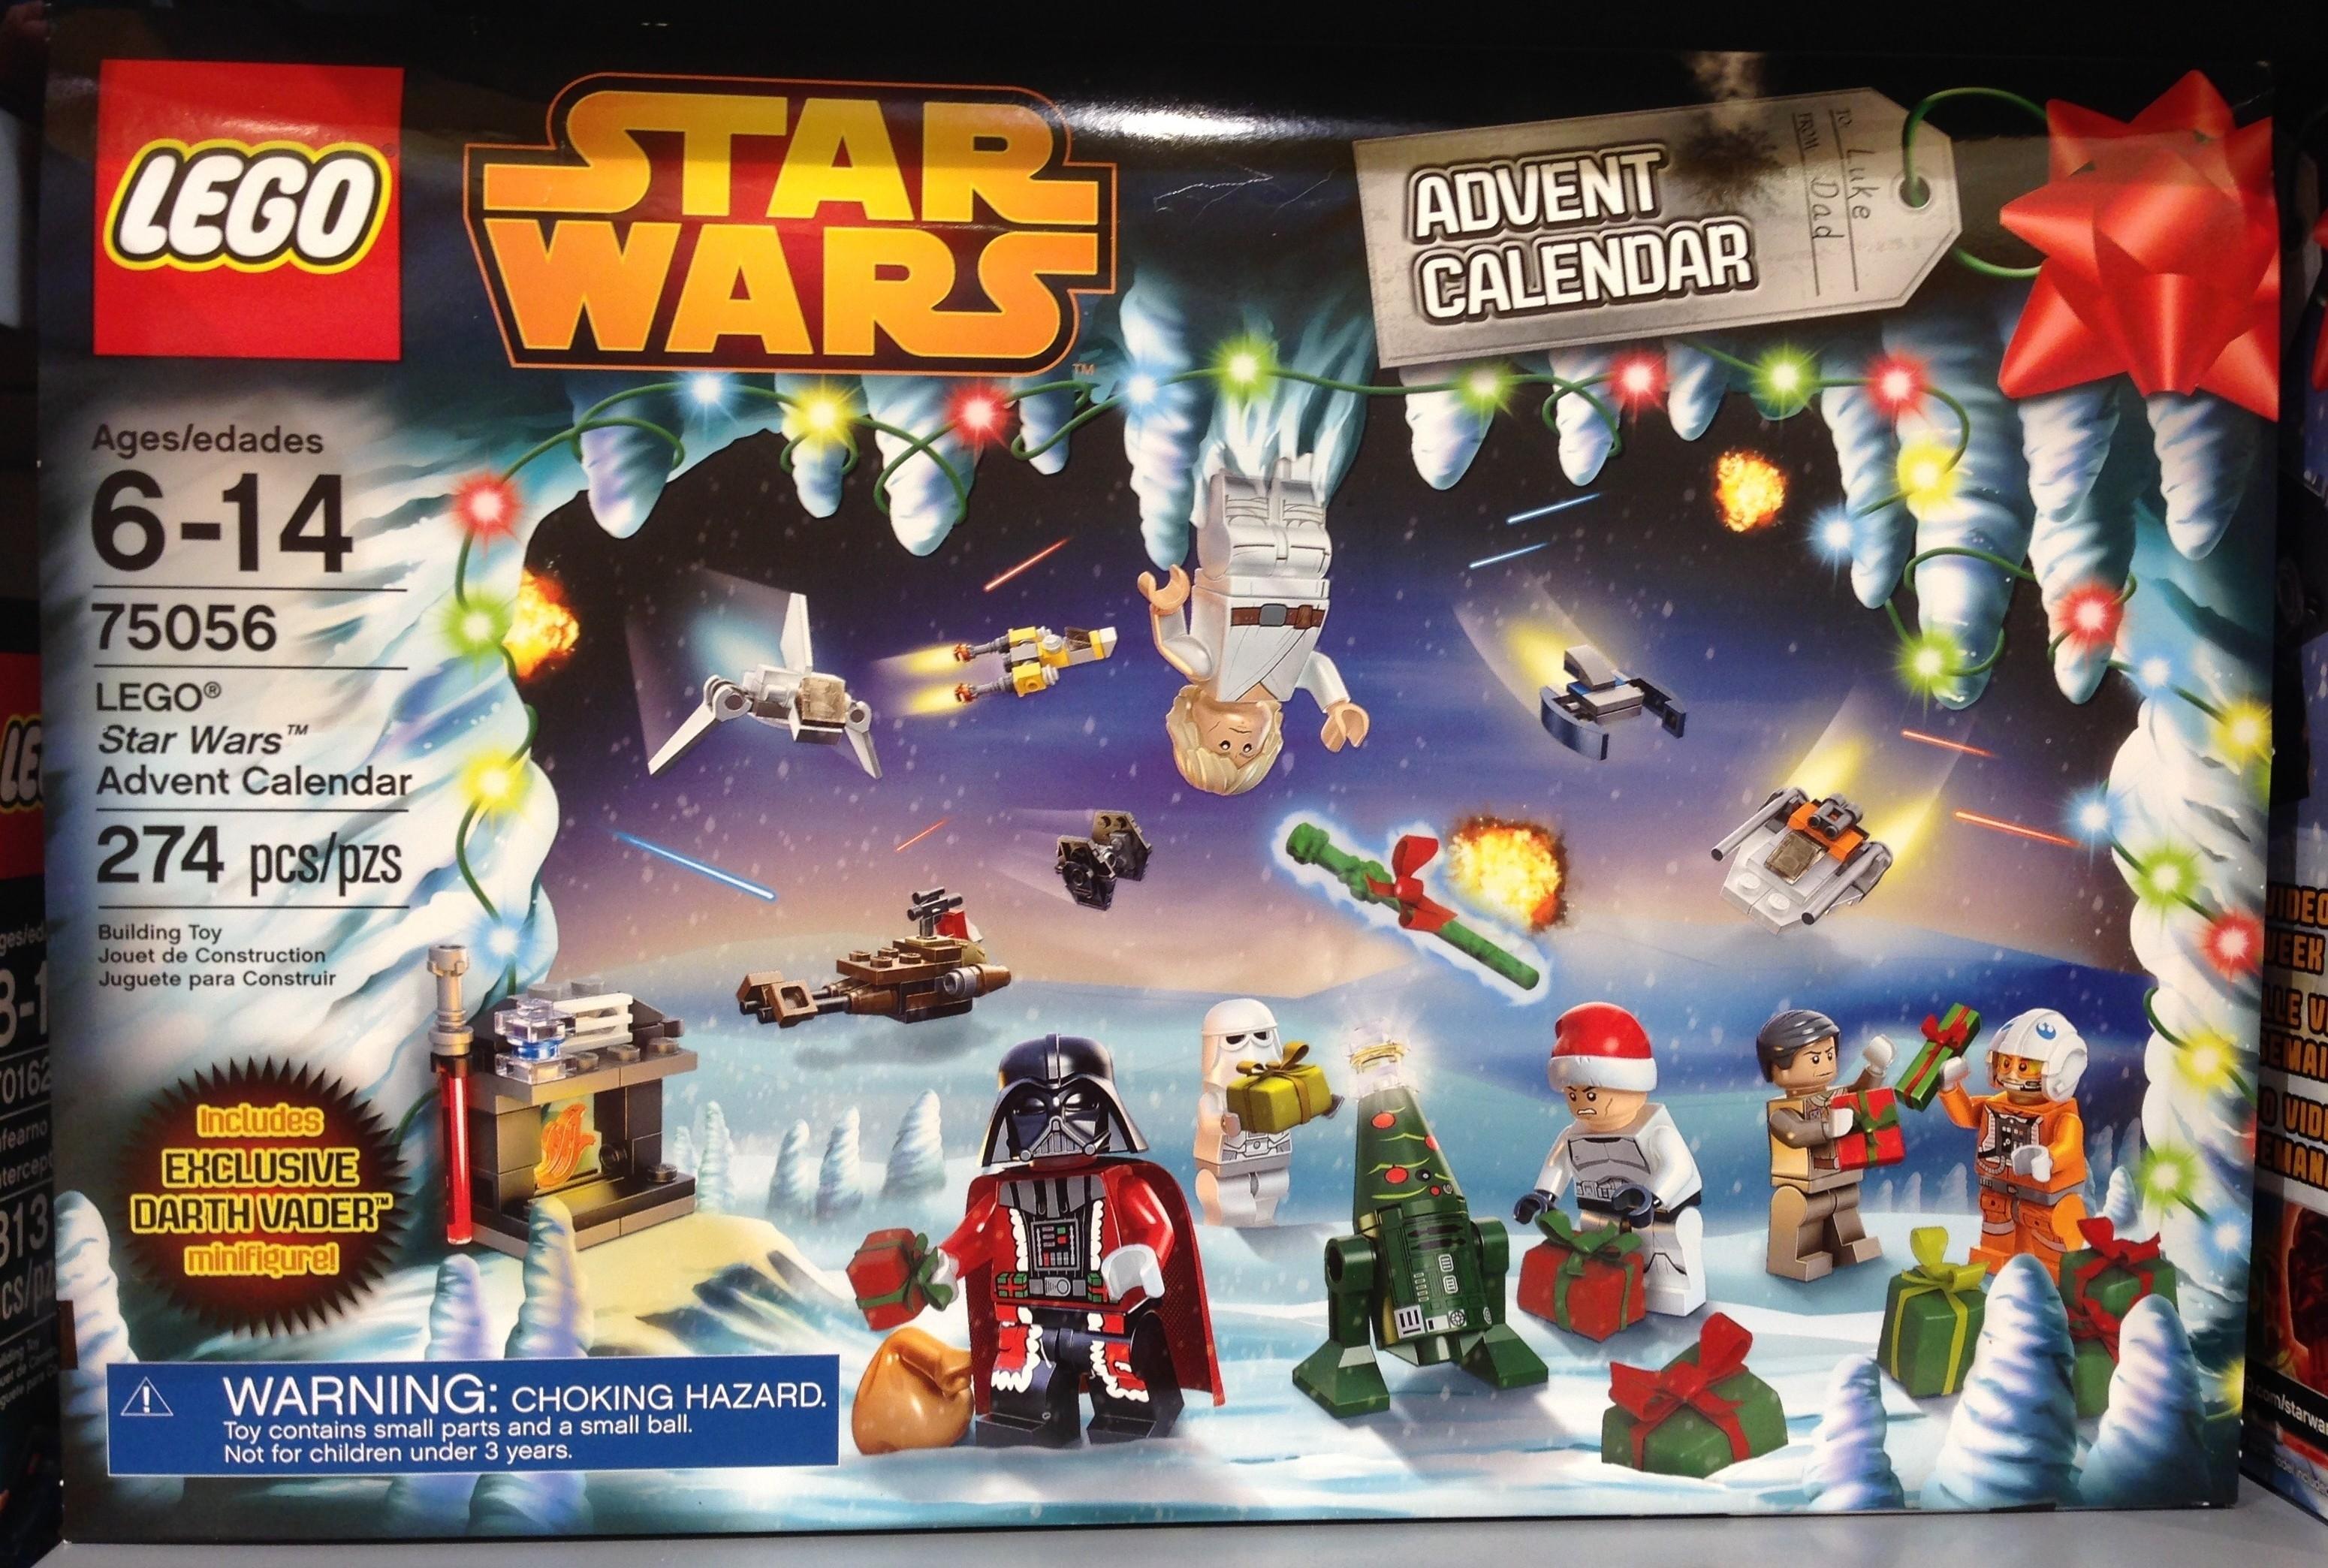 Lego Star Wars 2014 Advent Calendar Released In Stores! - Bricks And in Lego Star Wars Advent Calendar Code